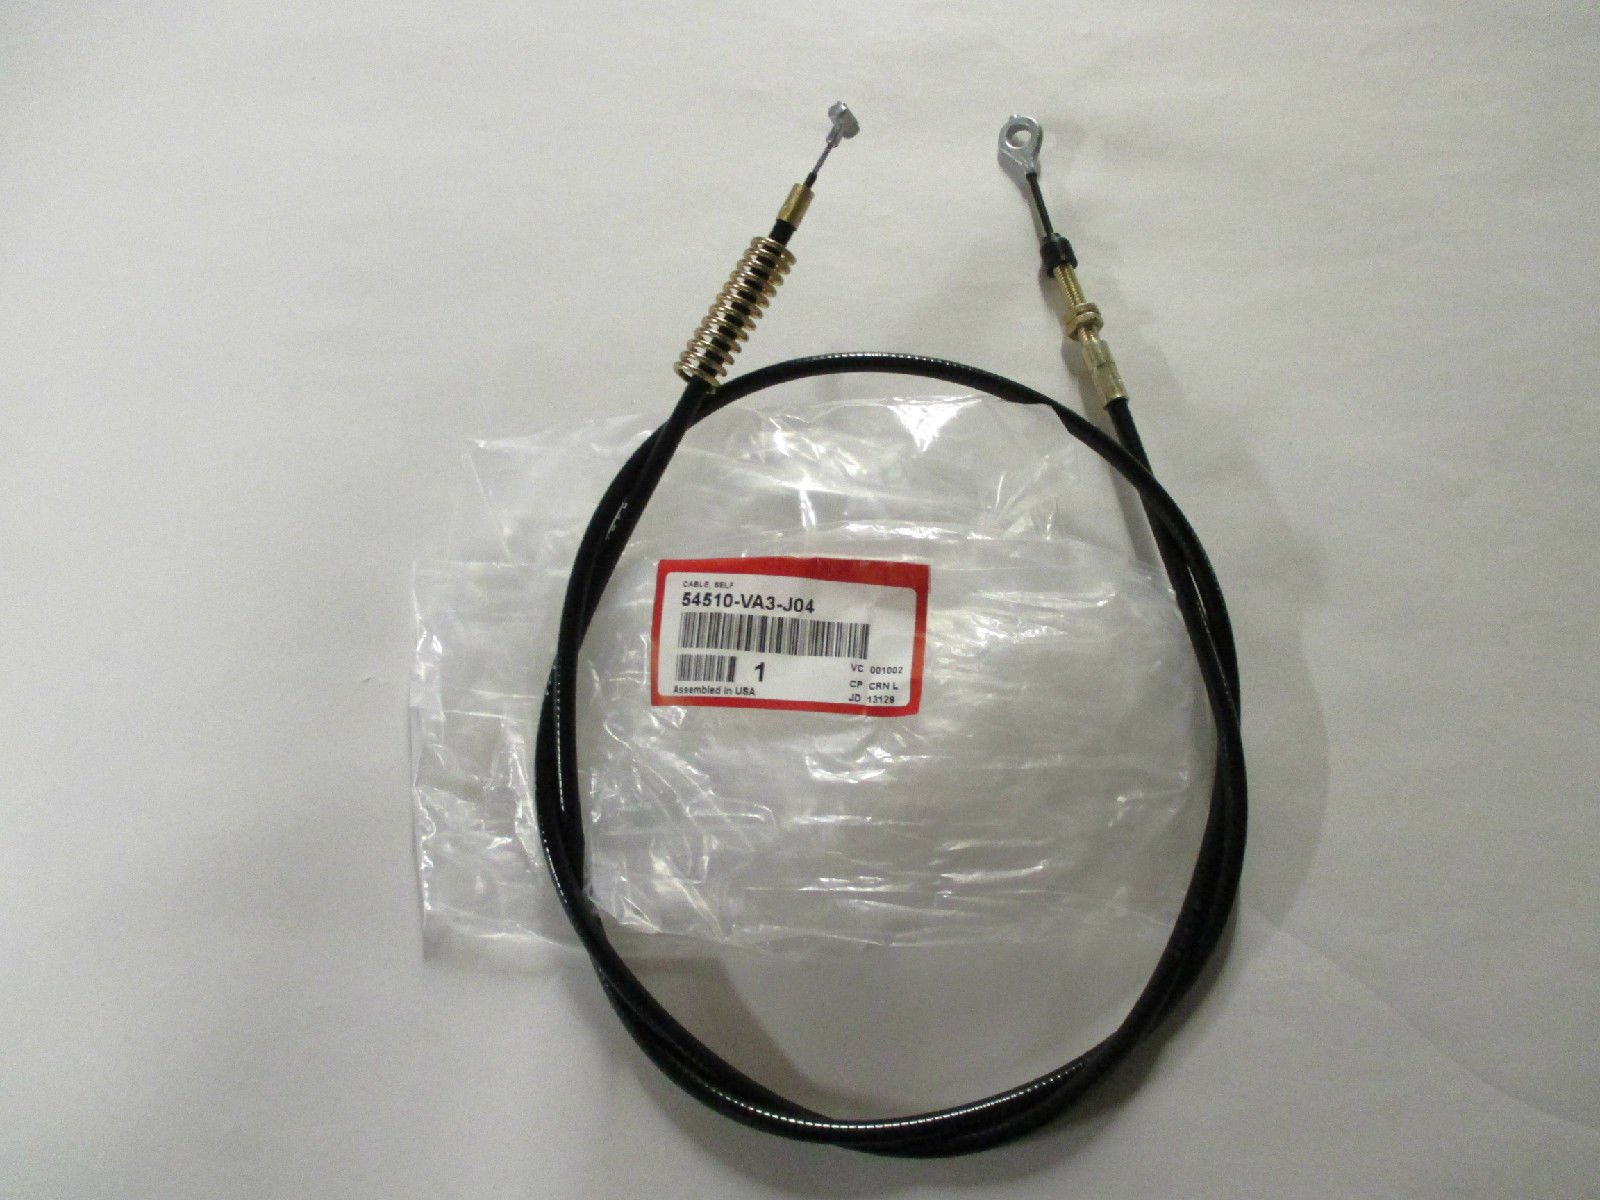 Honda 54510-VA3-J04 Cable Self